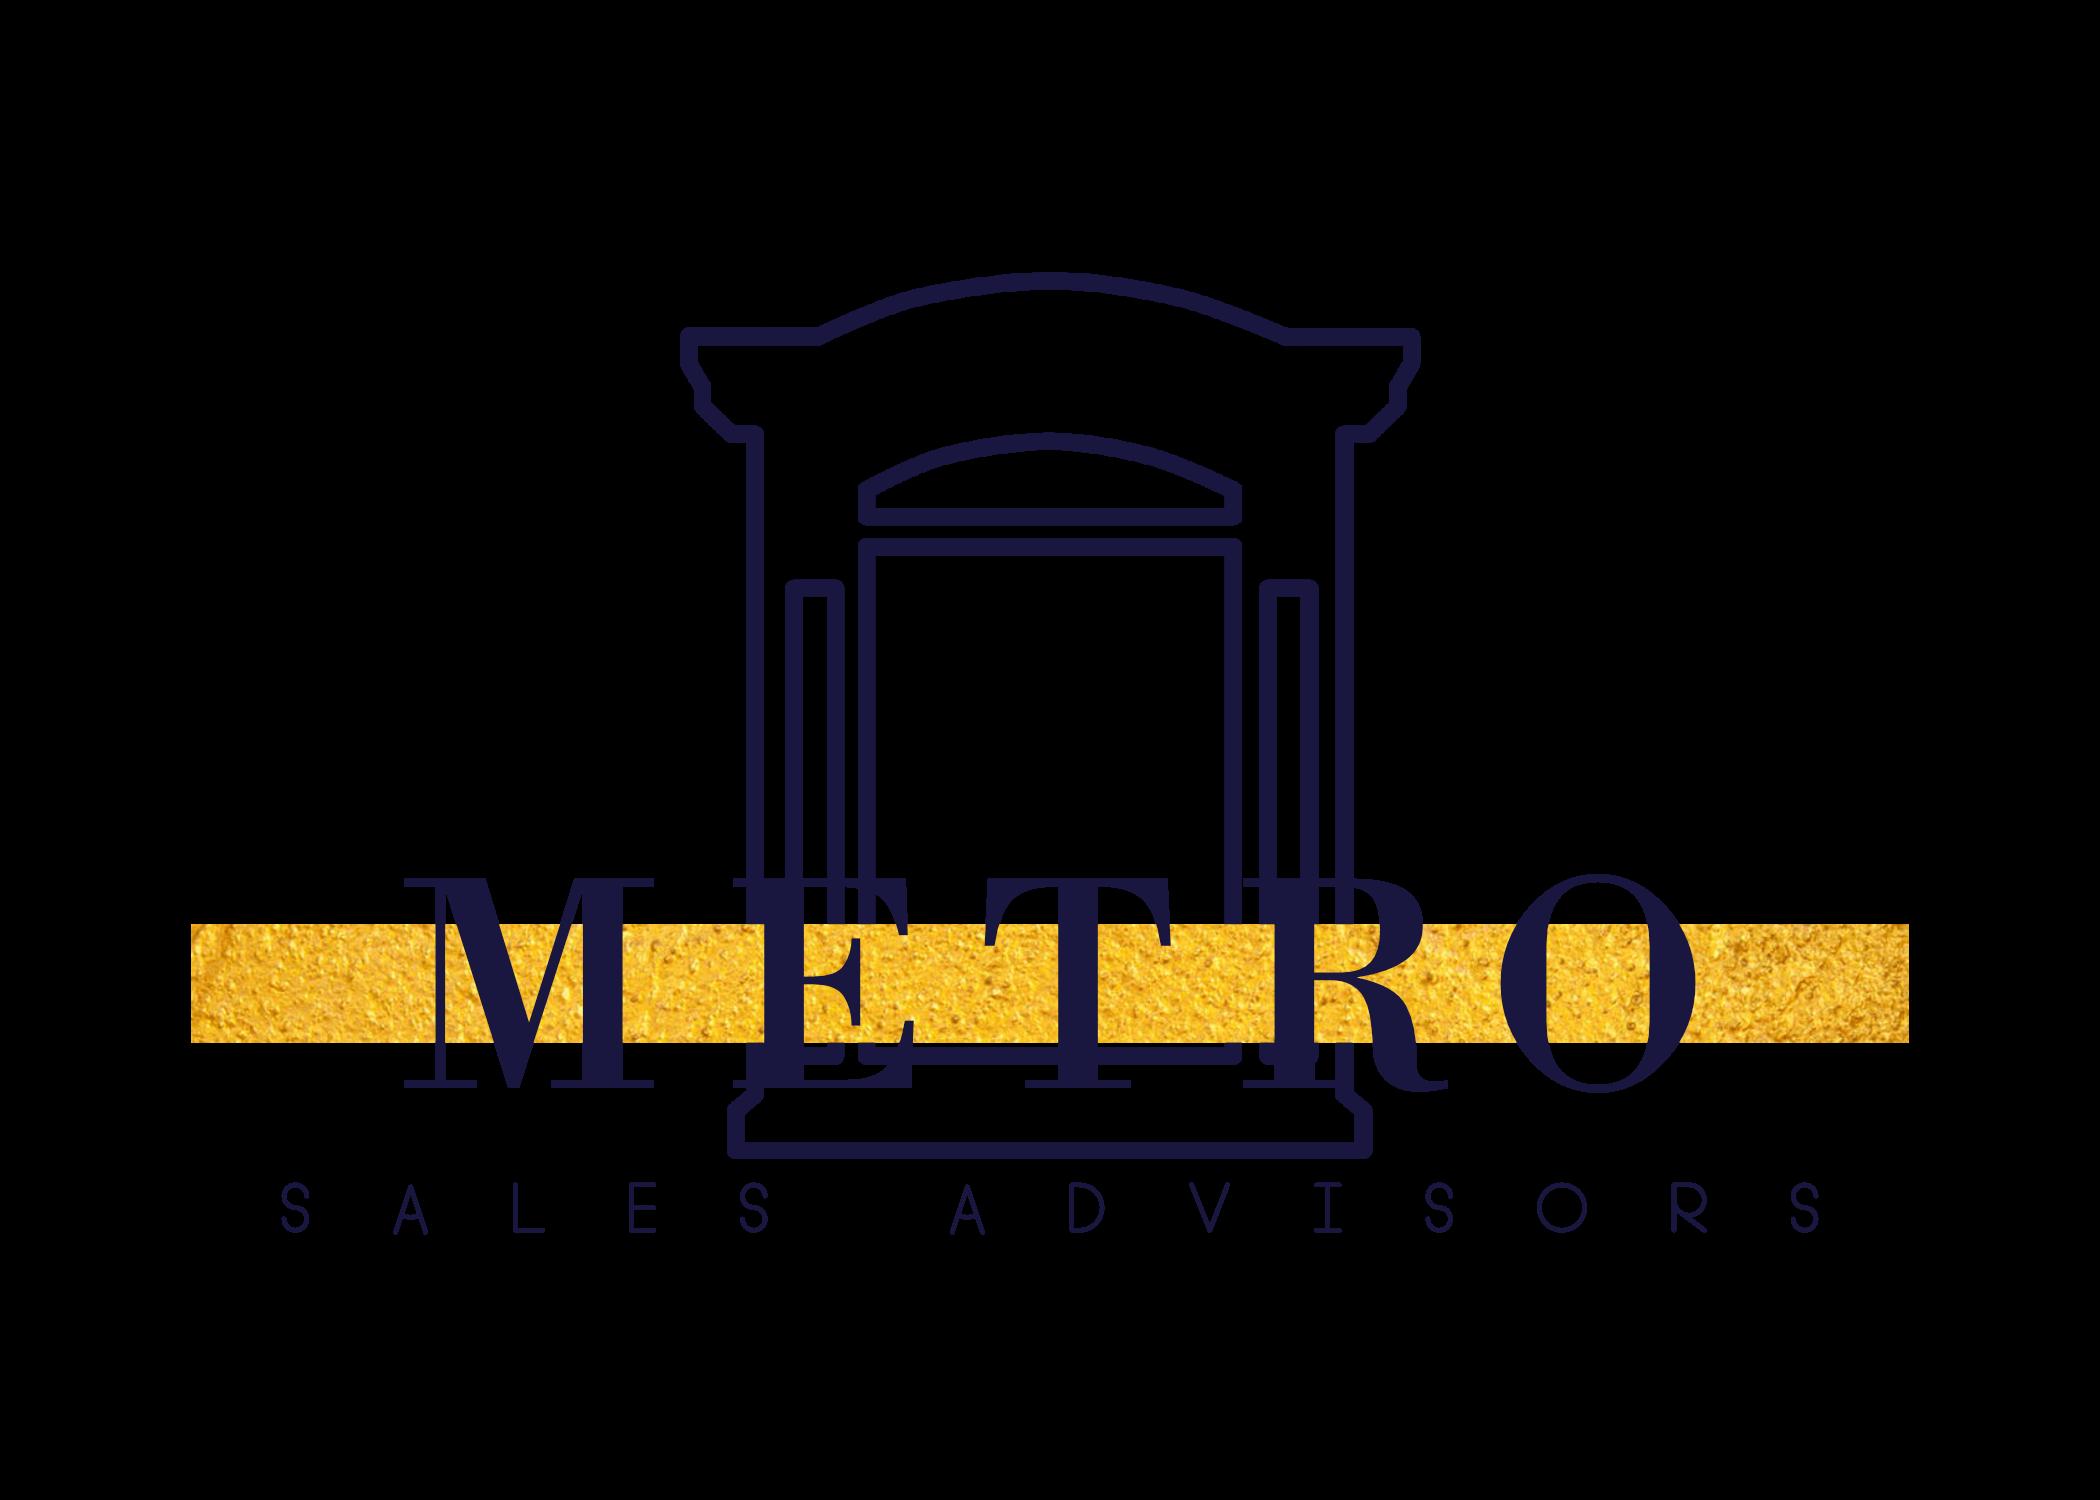 Metro Realty Corp logo